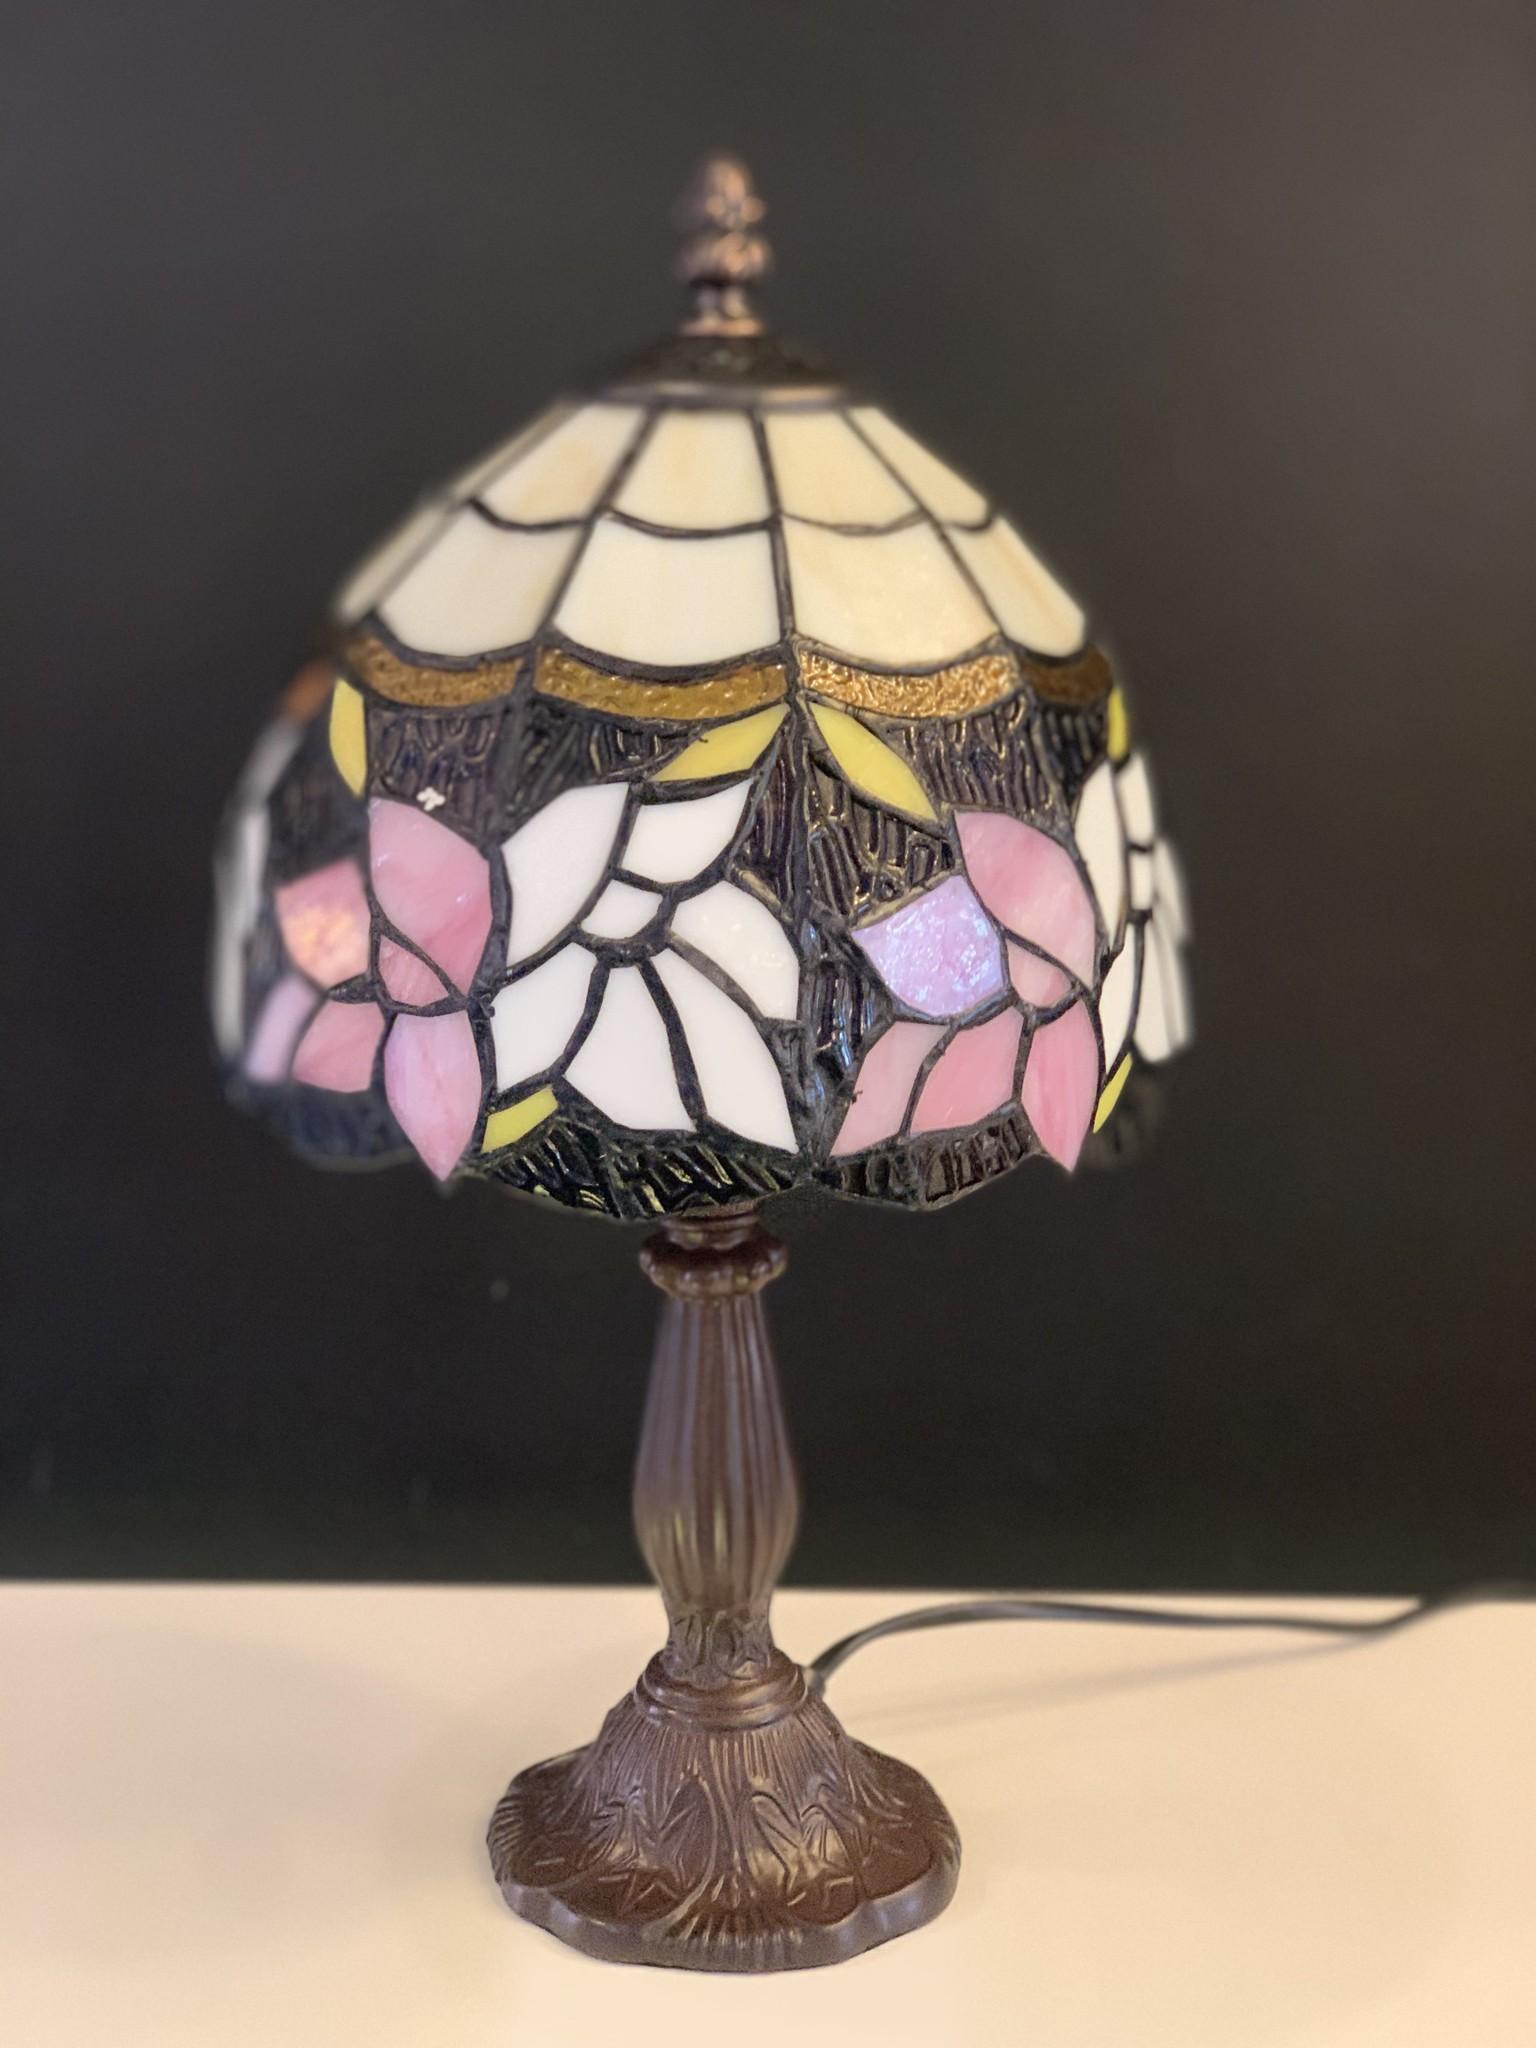 RoMaLux D10093 Tiffany Tafellampje